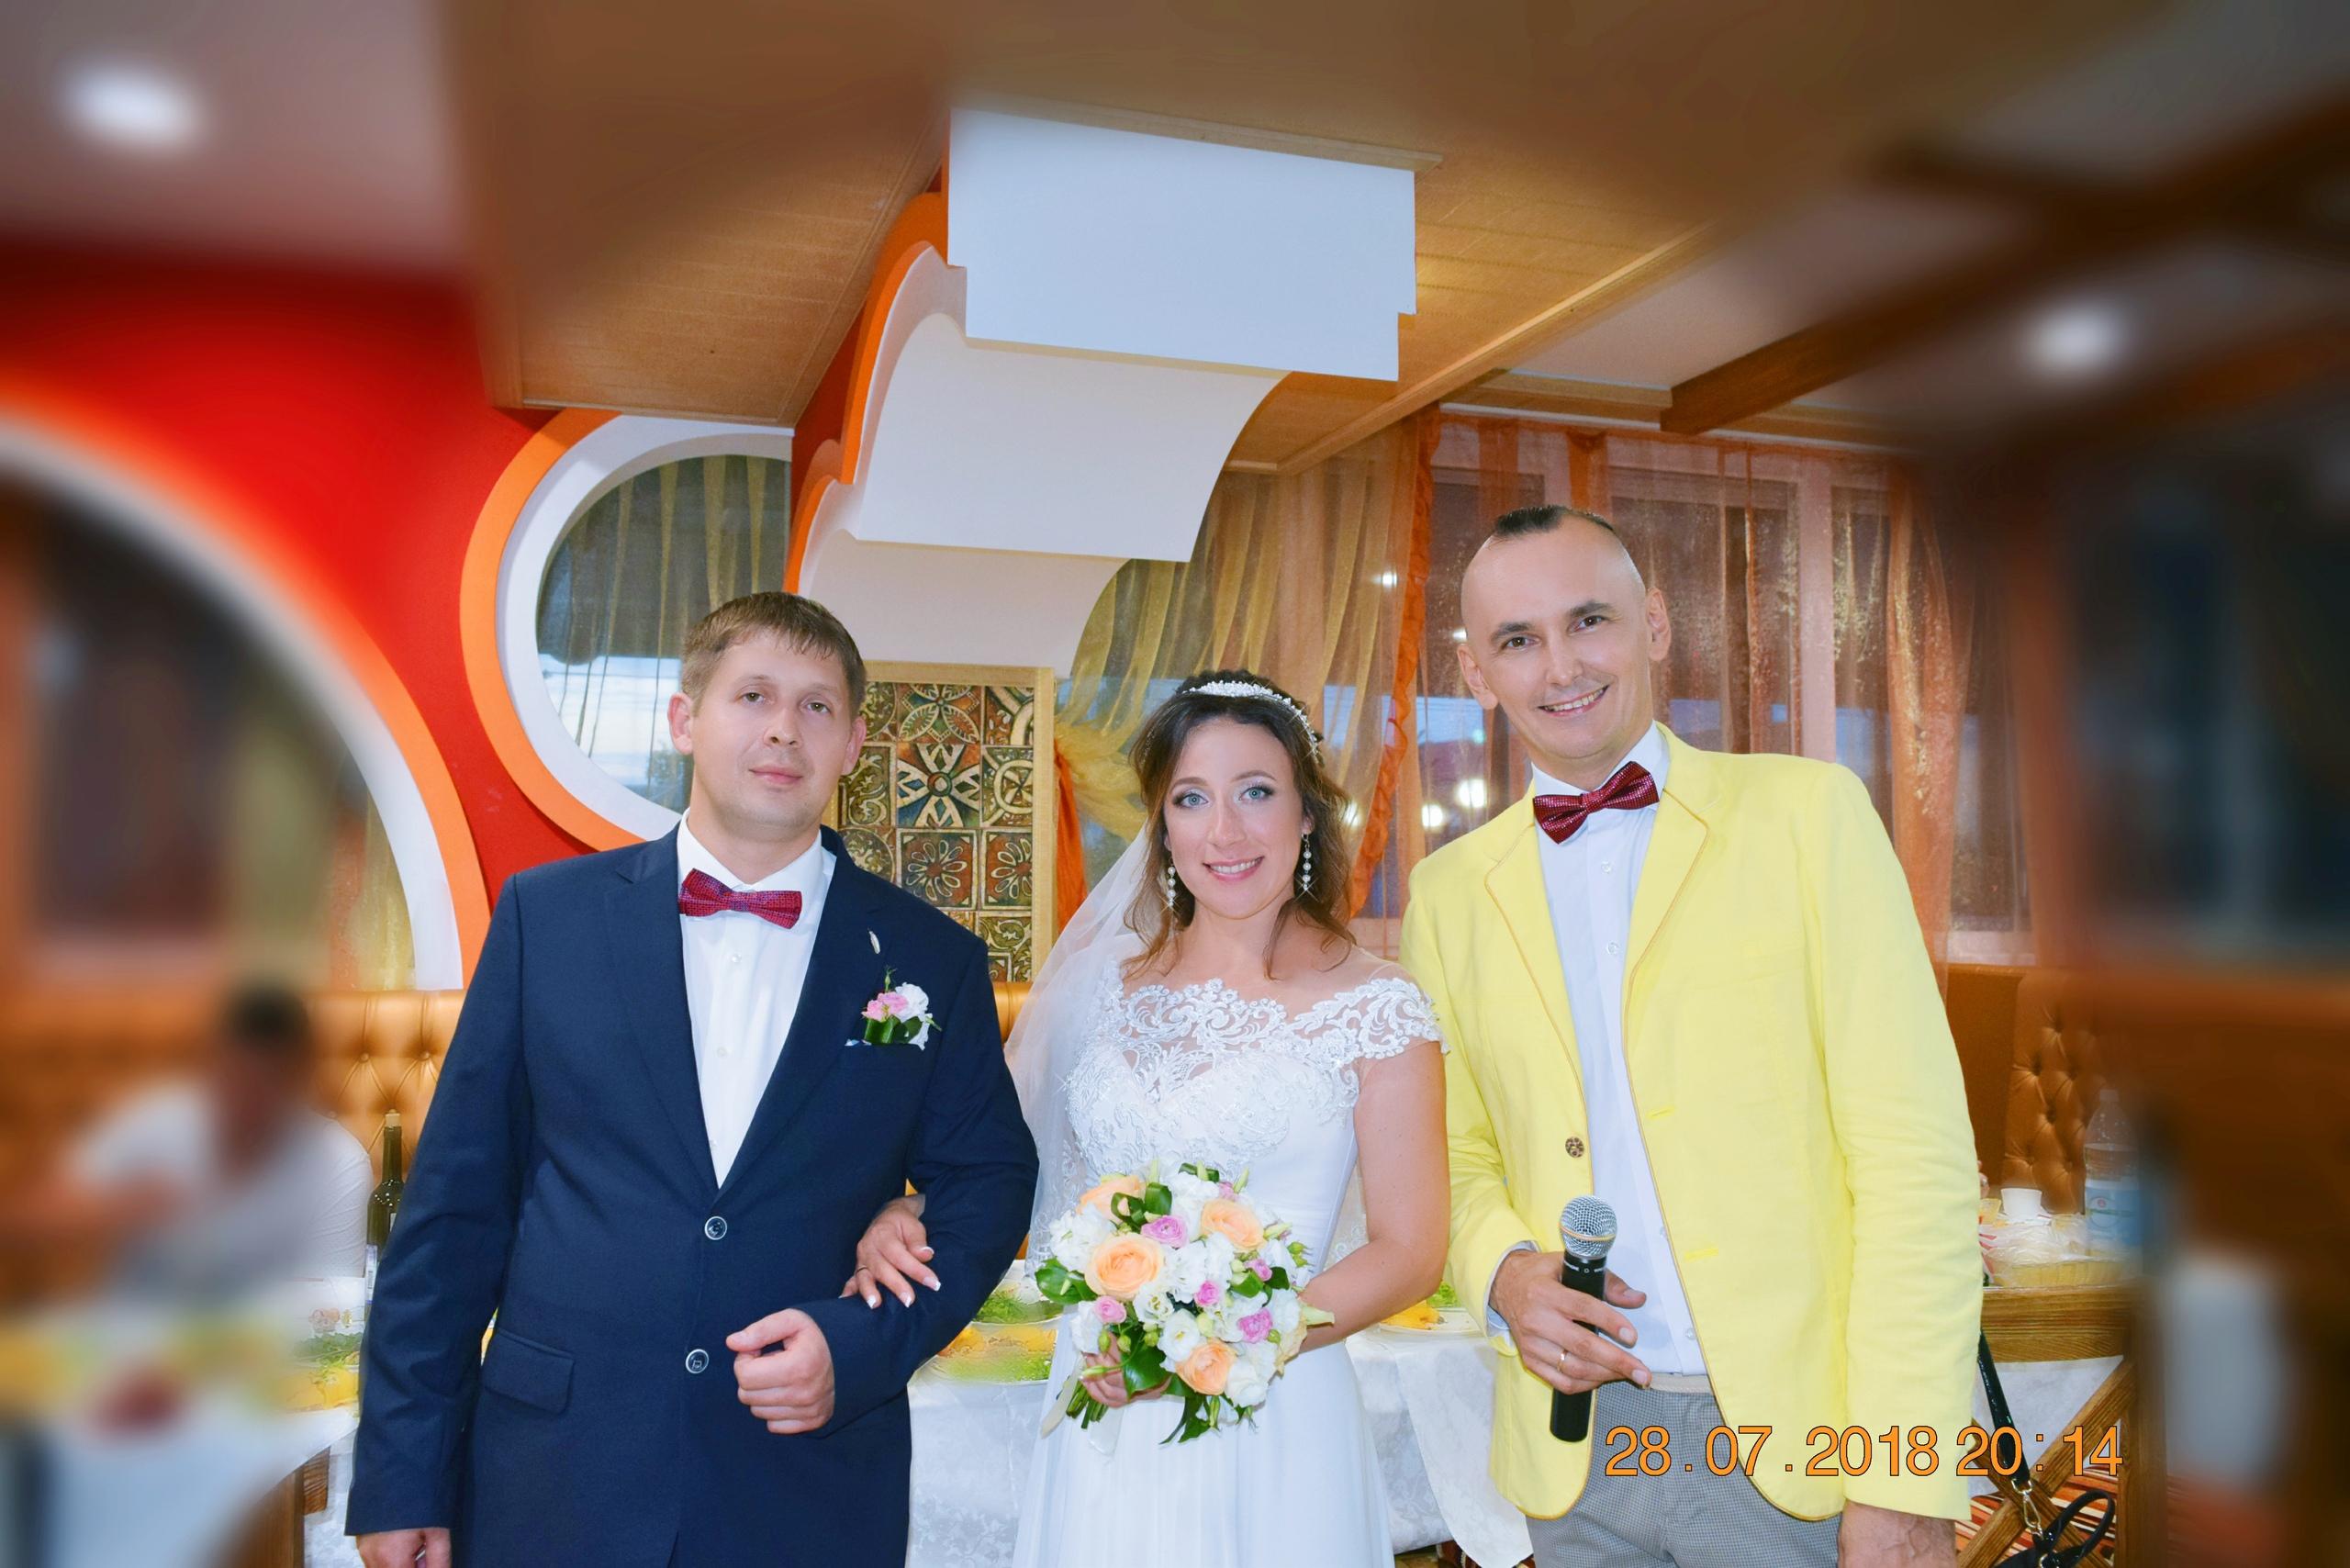 kr8XpofyFyk - Свадьба Степана и Ольги